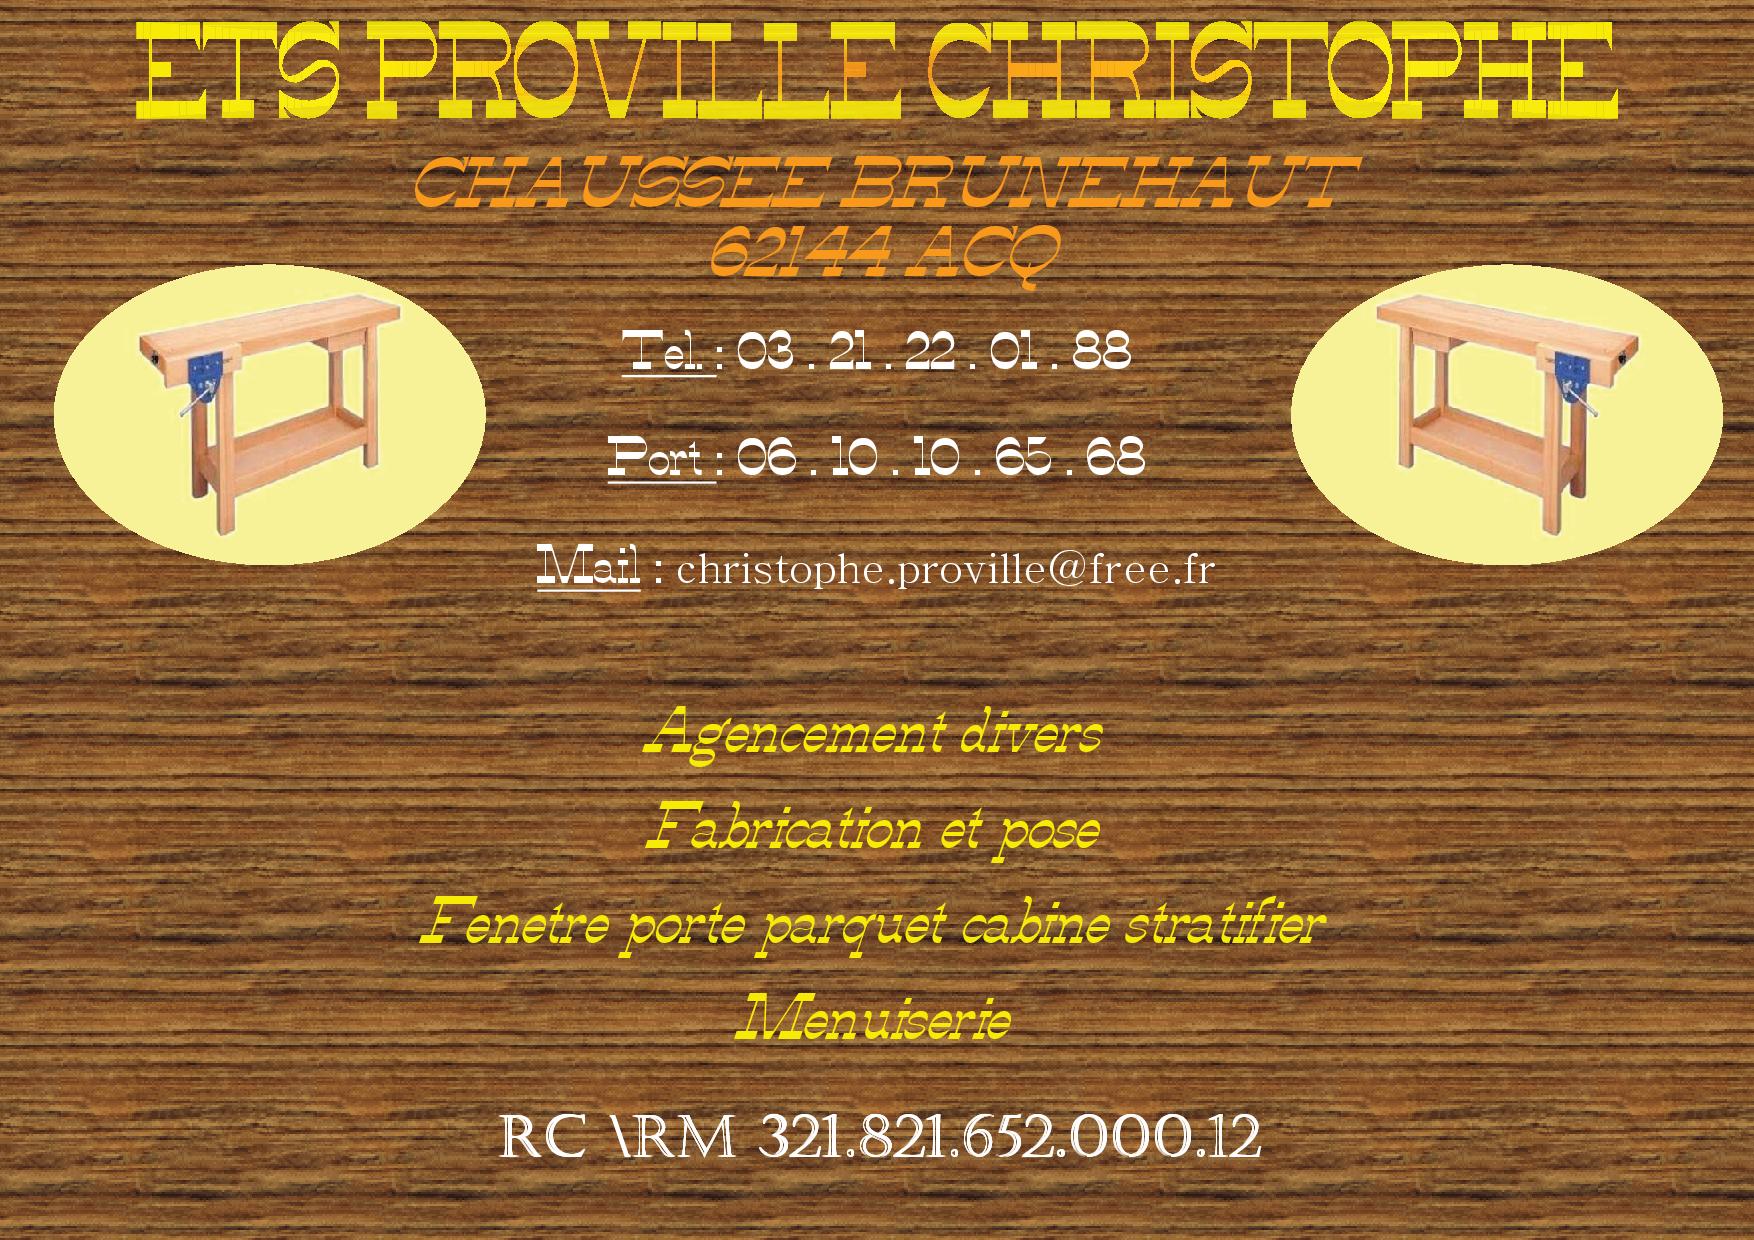 ETS Proville.png